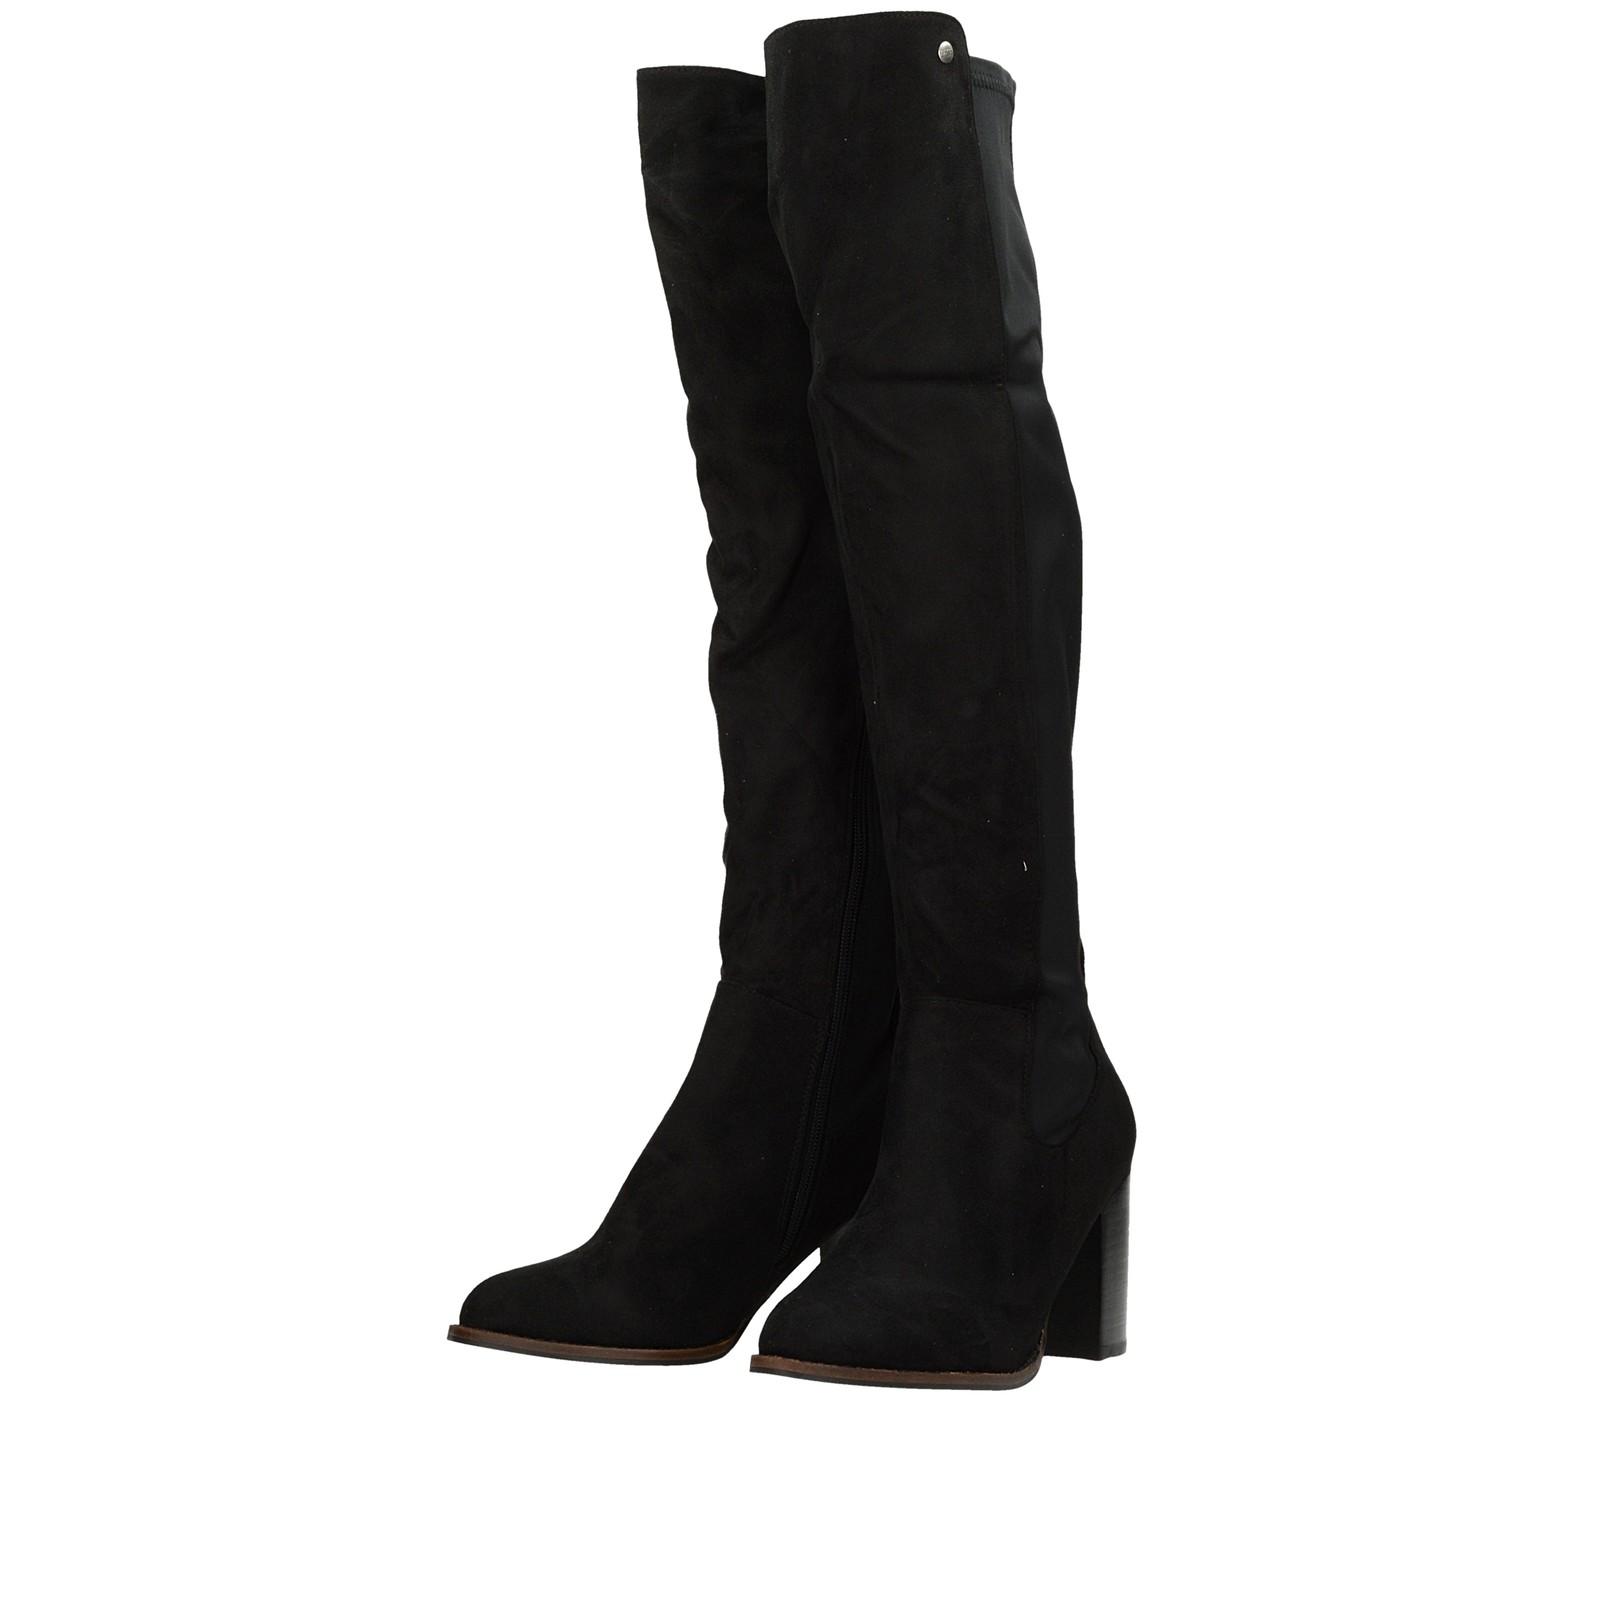 02711dd09aa7 ... Big Star dámske textilné vysoké čižmy - čierne ...